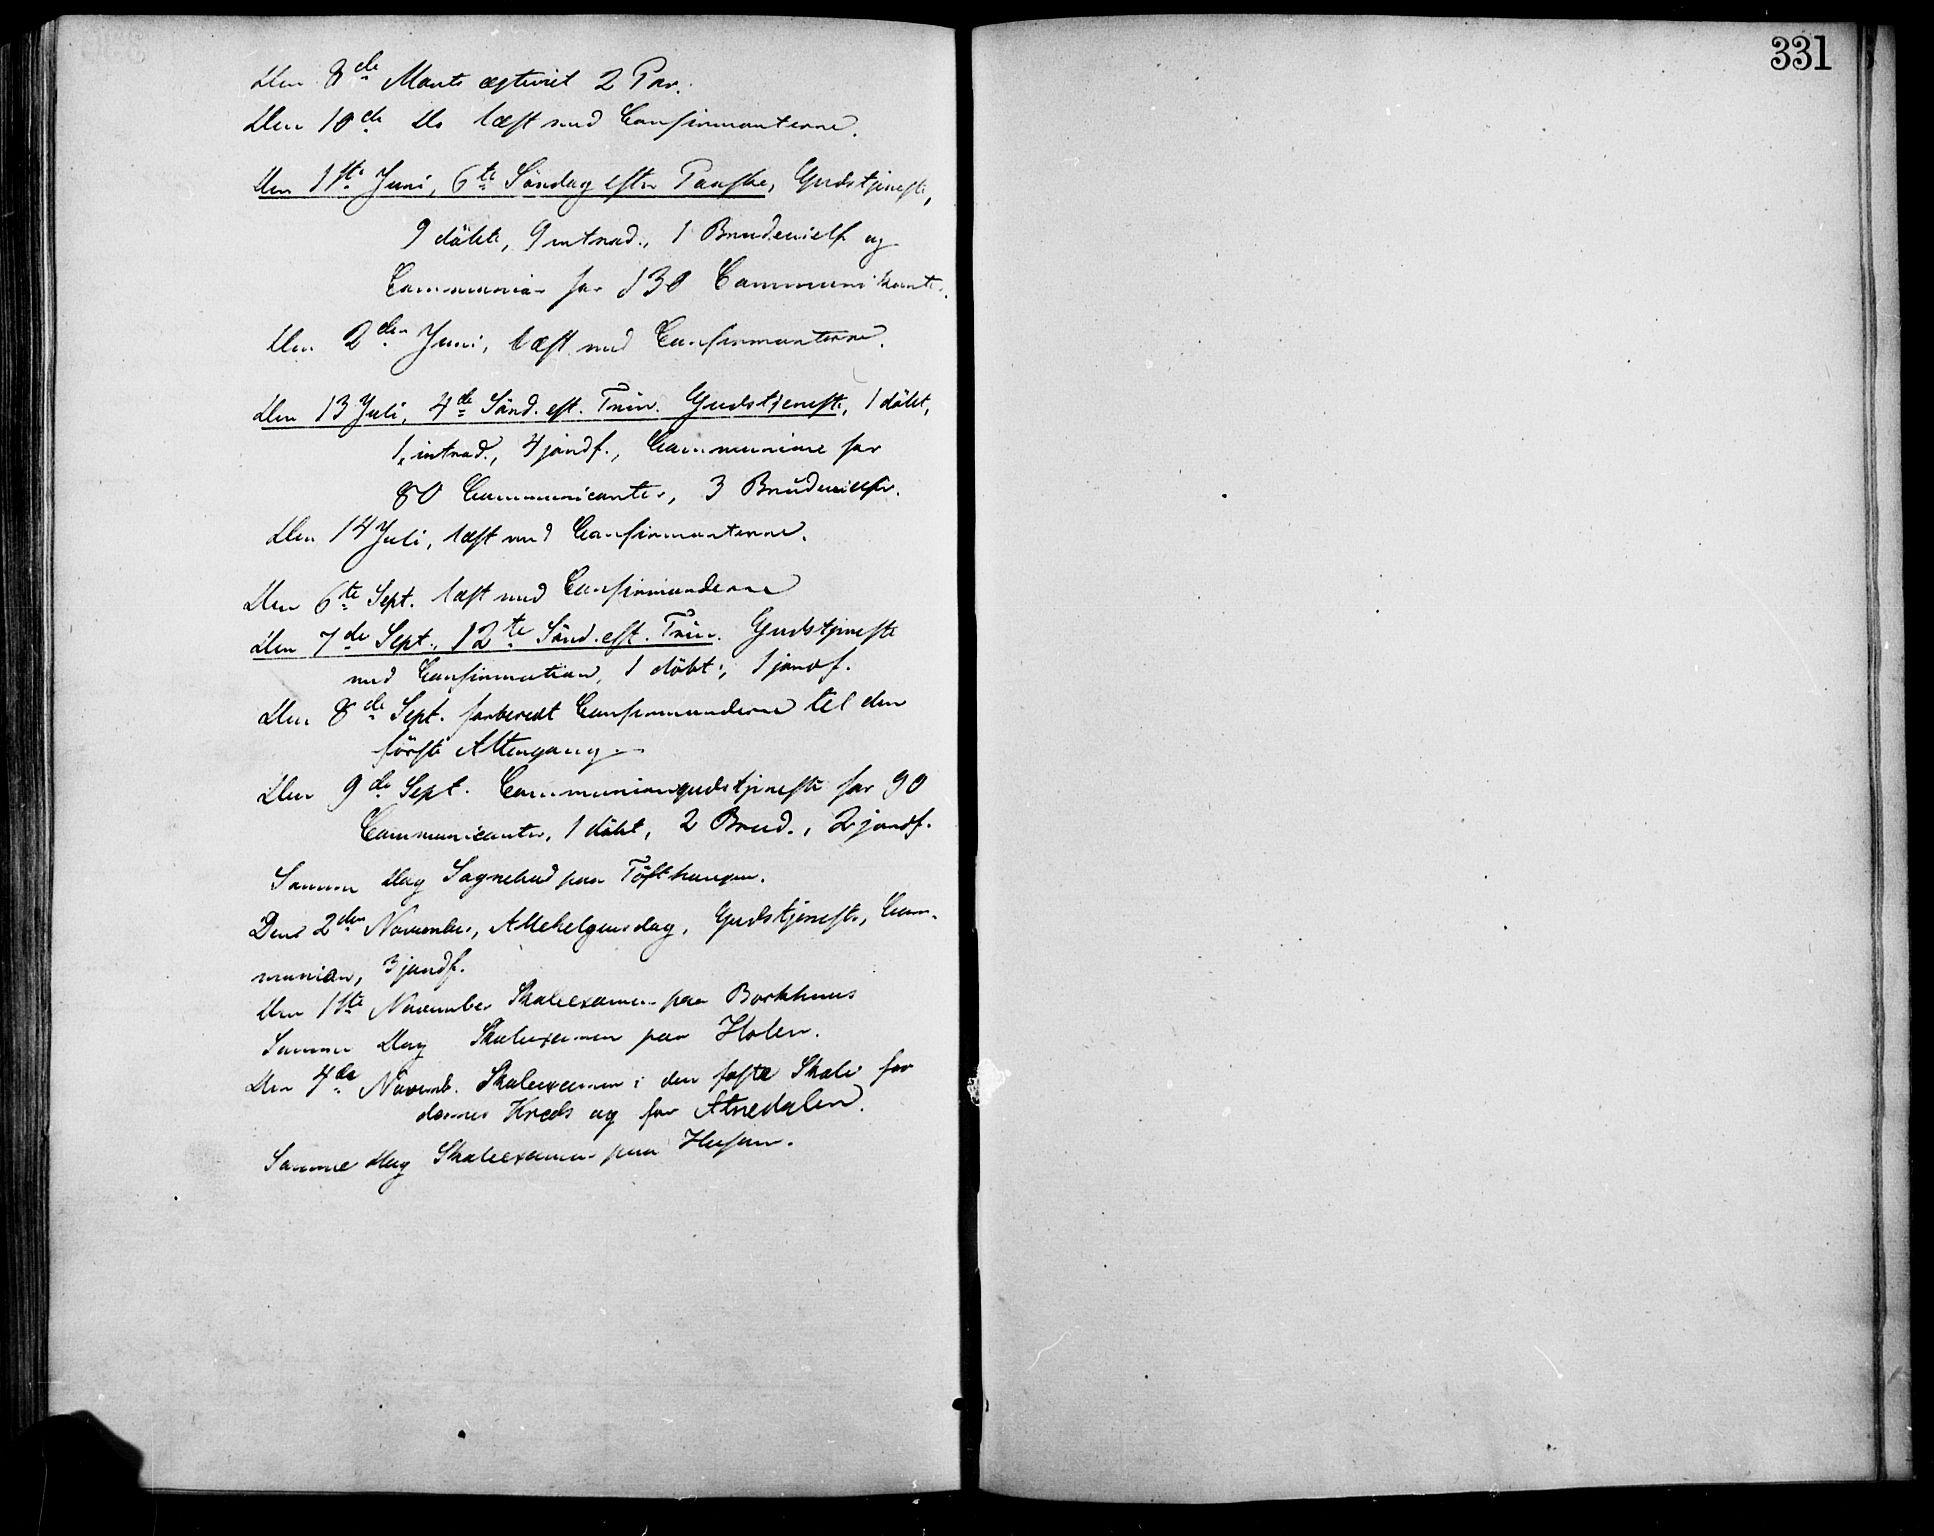 SAH, Lesja prestekontor, Ministerialbok nr. 7, 1854-1862, s. 331